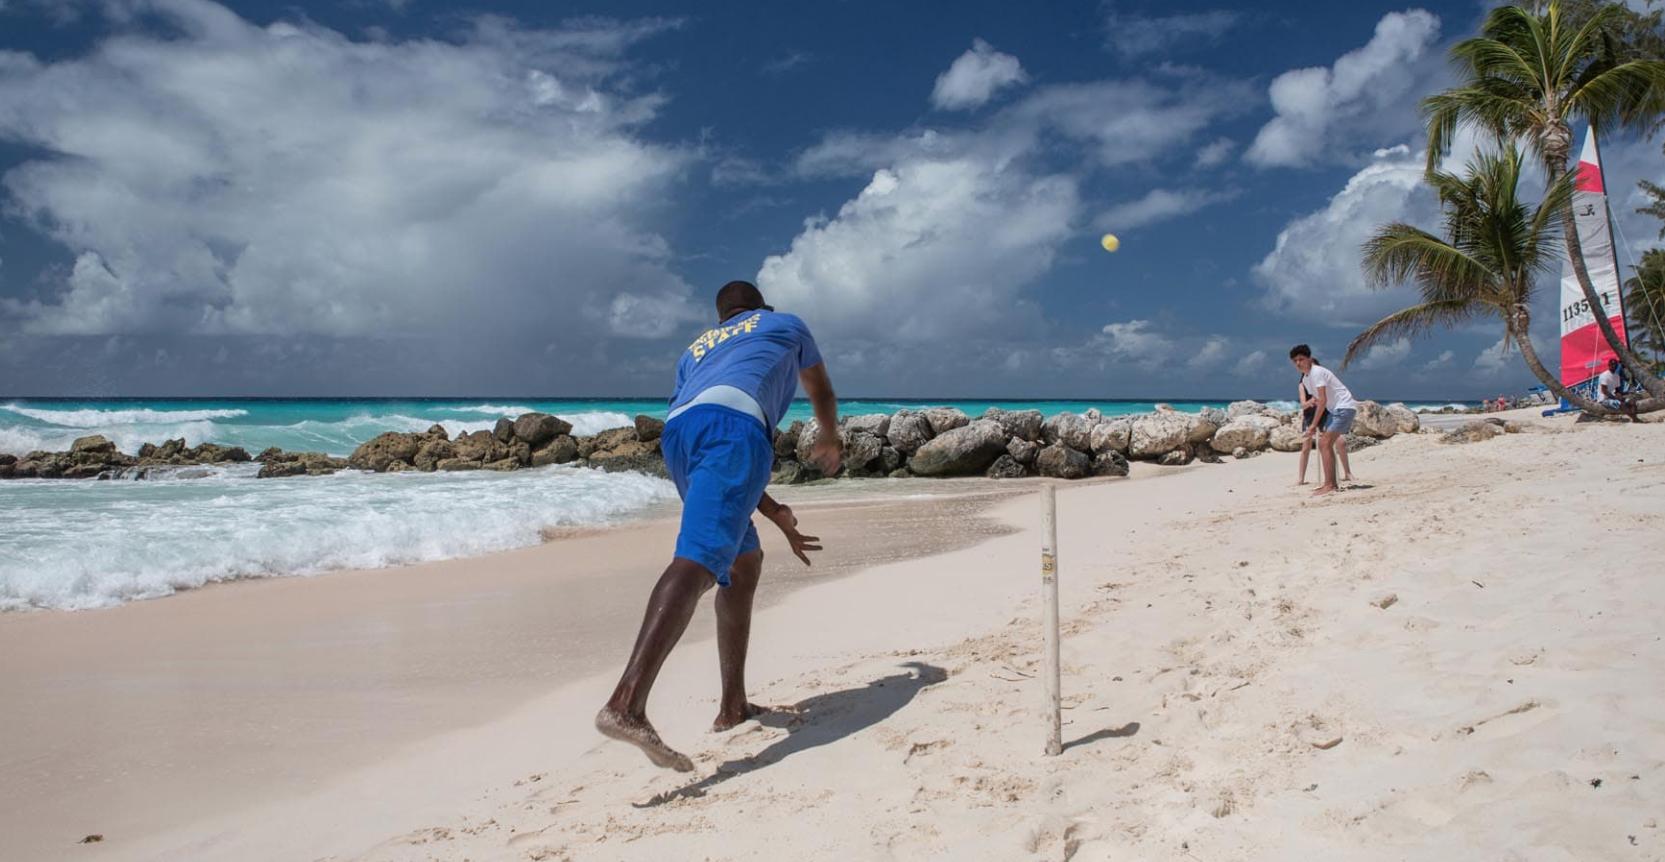 A game of beach cricket